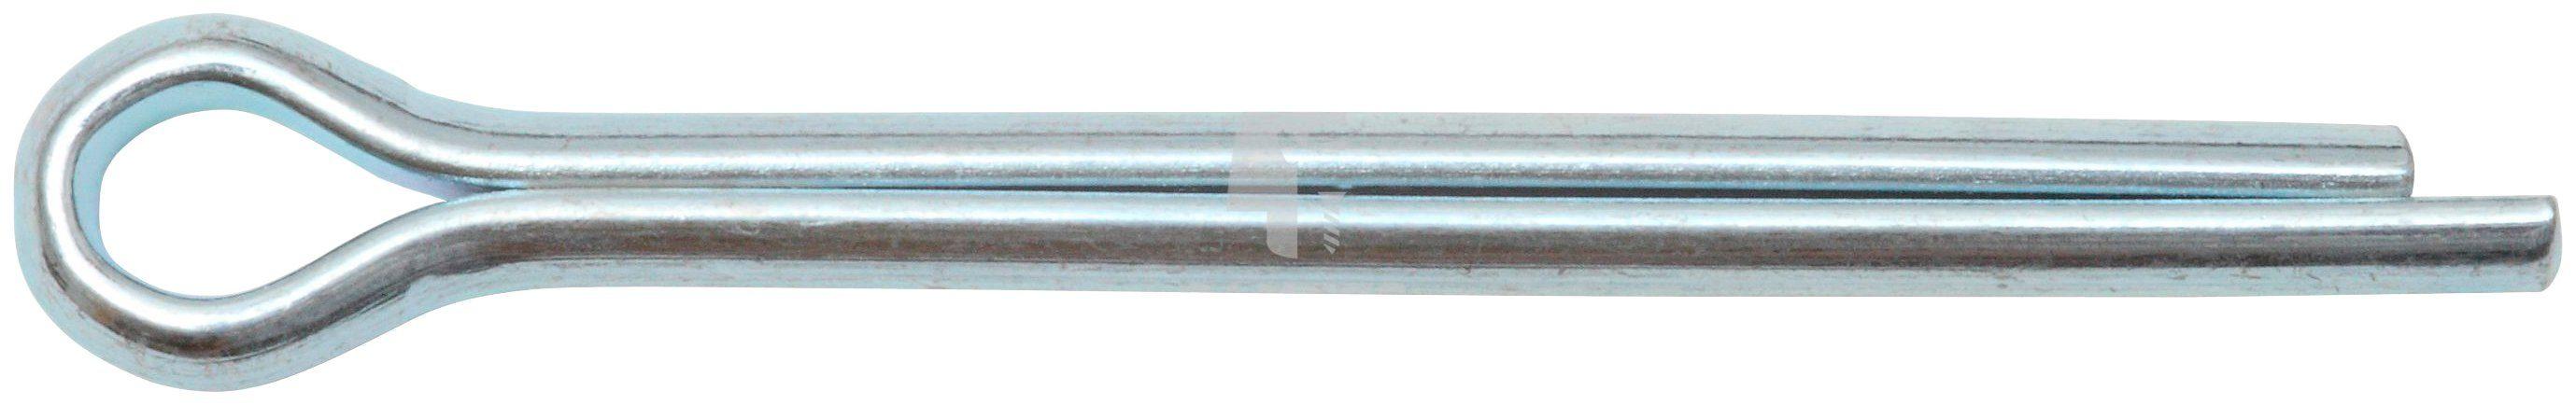 RAMSES Splint , DIN 94 6,3 x 63 mm Stahl verzinkt 50 Stück